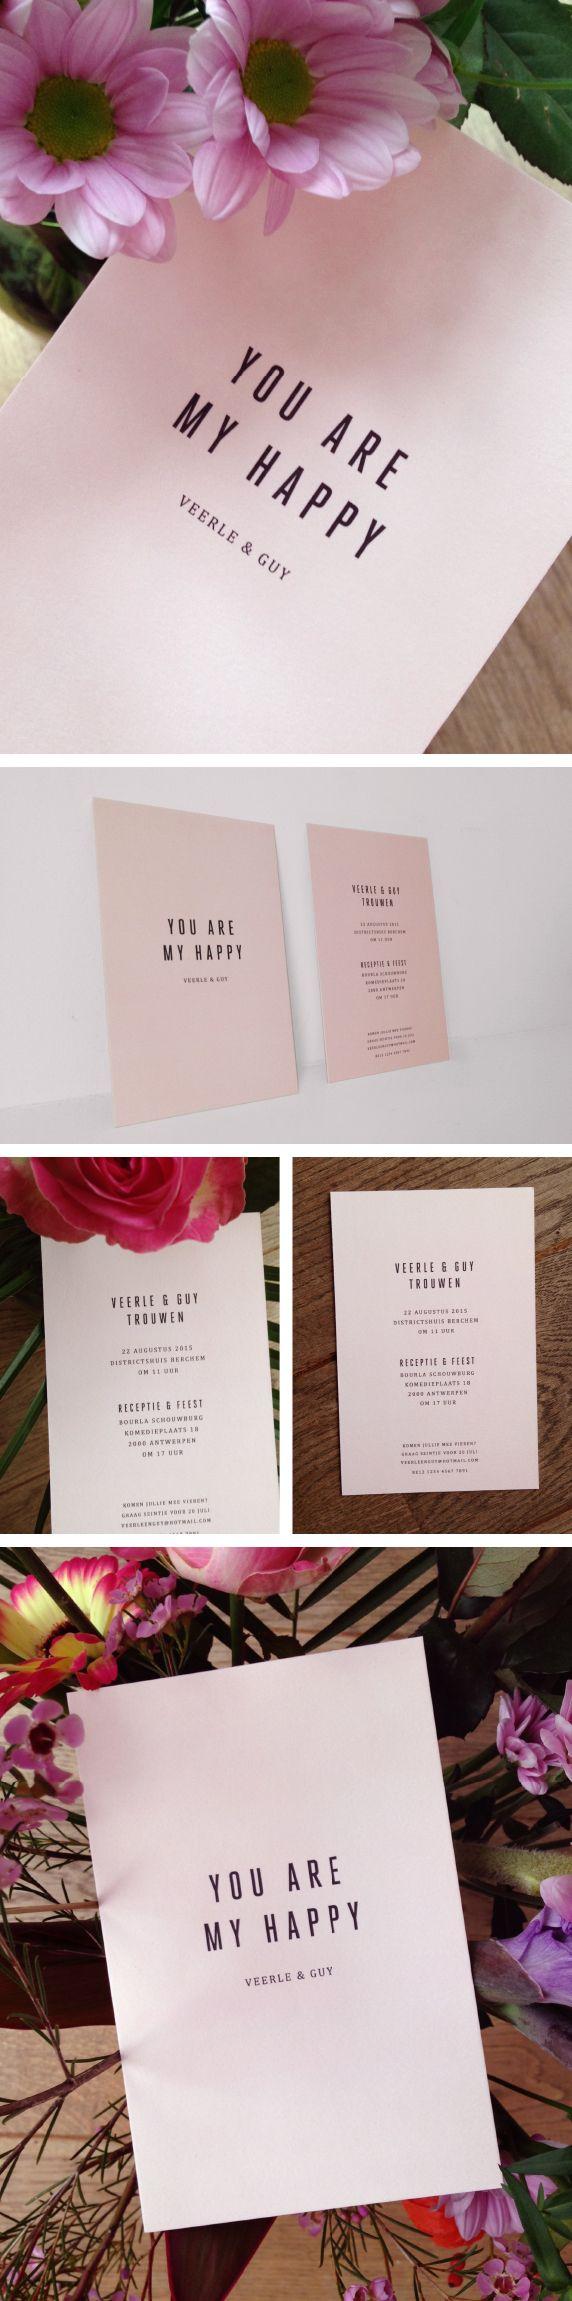 wedding, invitation, pink, you are my happy, love, typo, strak, eenvoud, roos, trouwuitnodiging, minimal, love quote